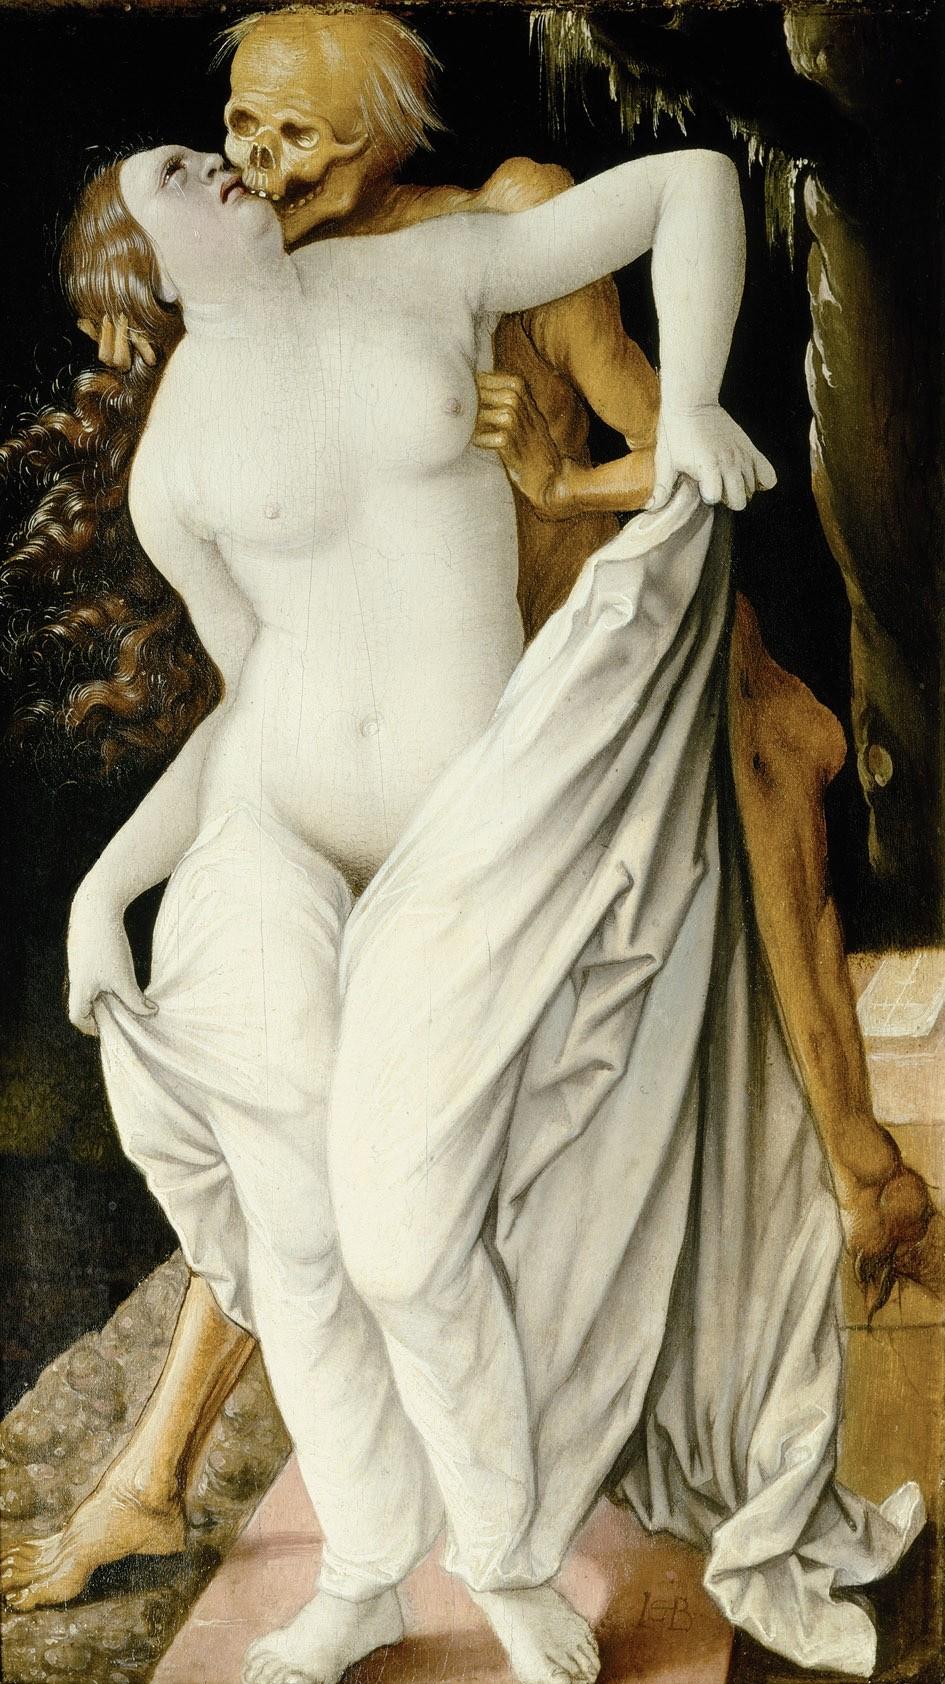 05. Hans Baldung Grien. 1518-20 Death and the Maiden.